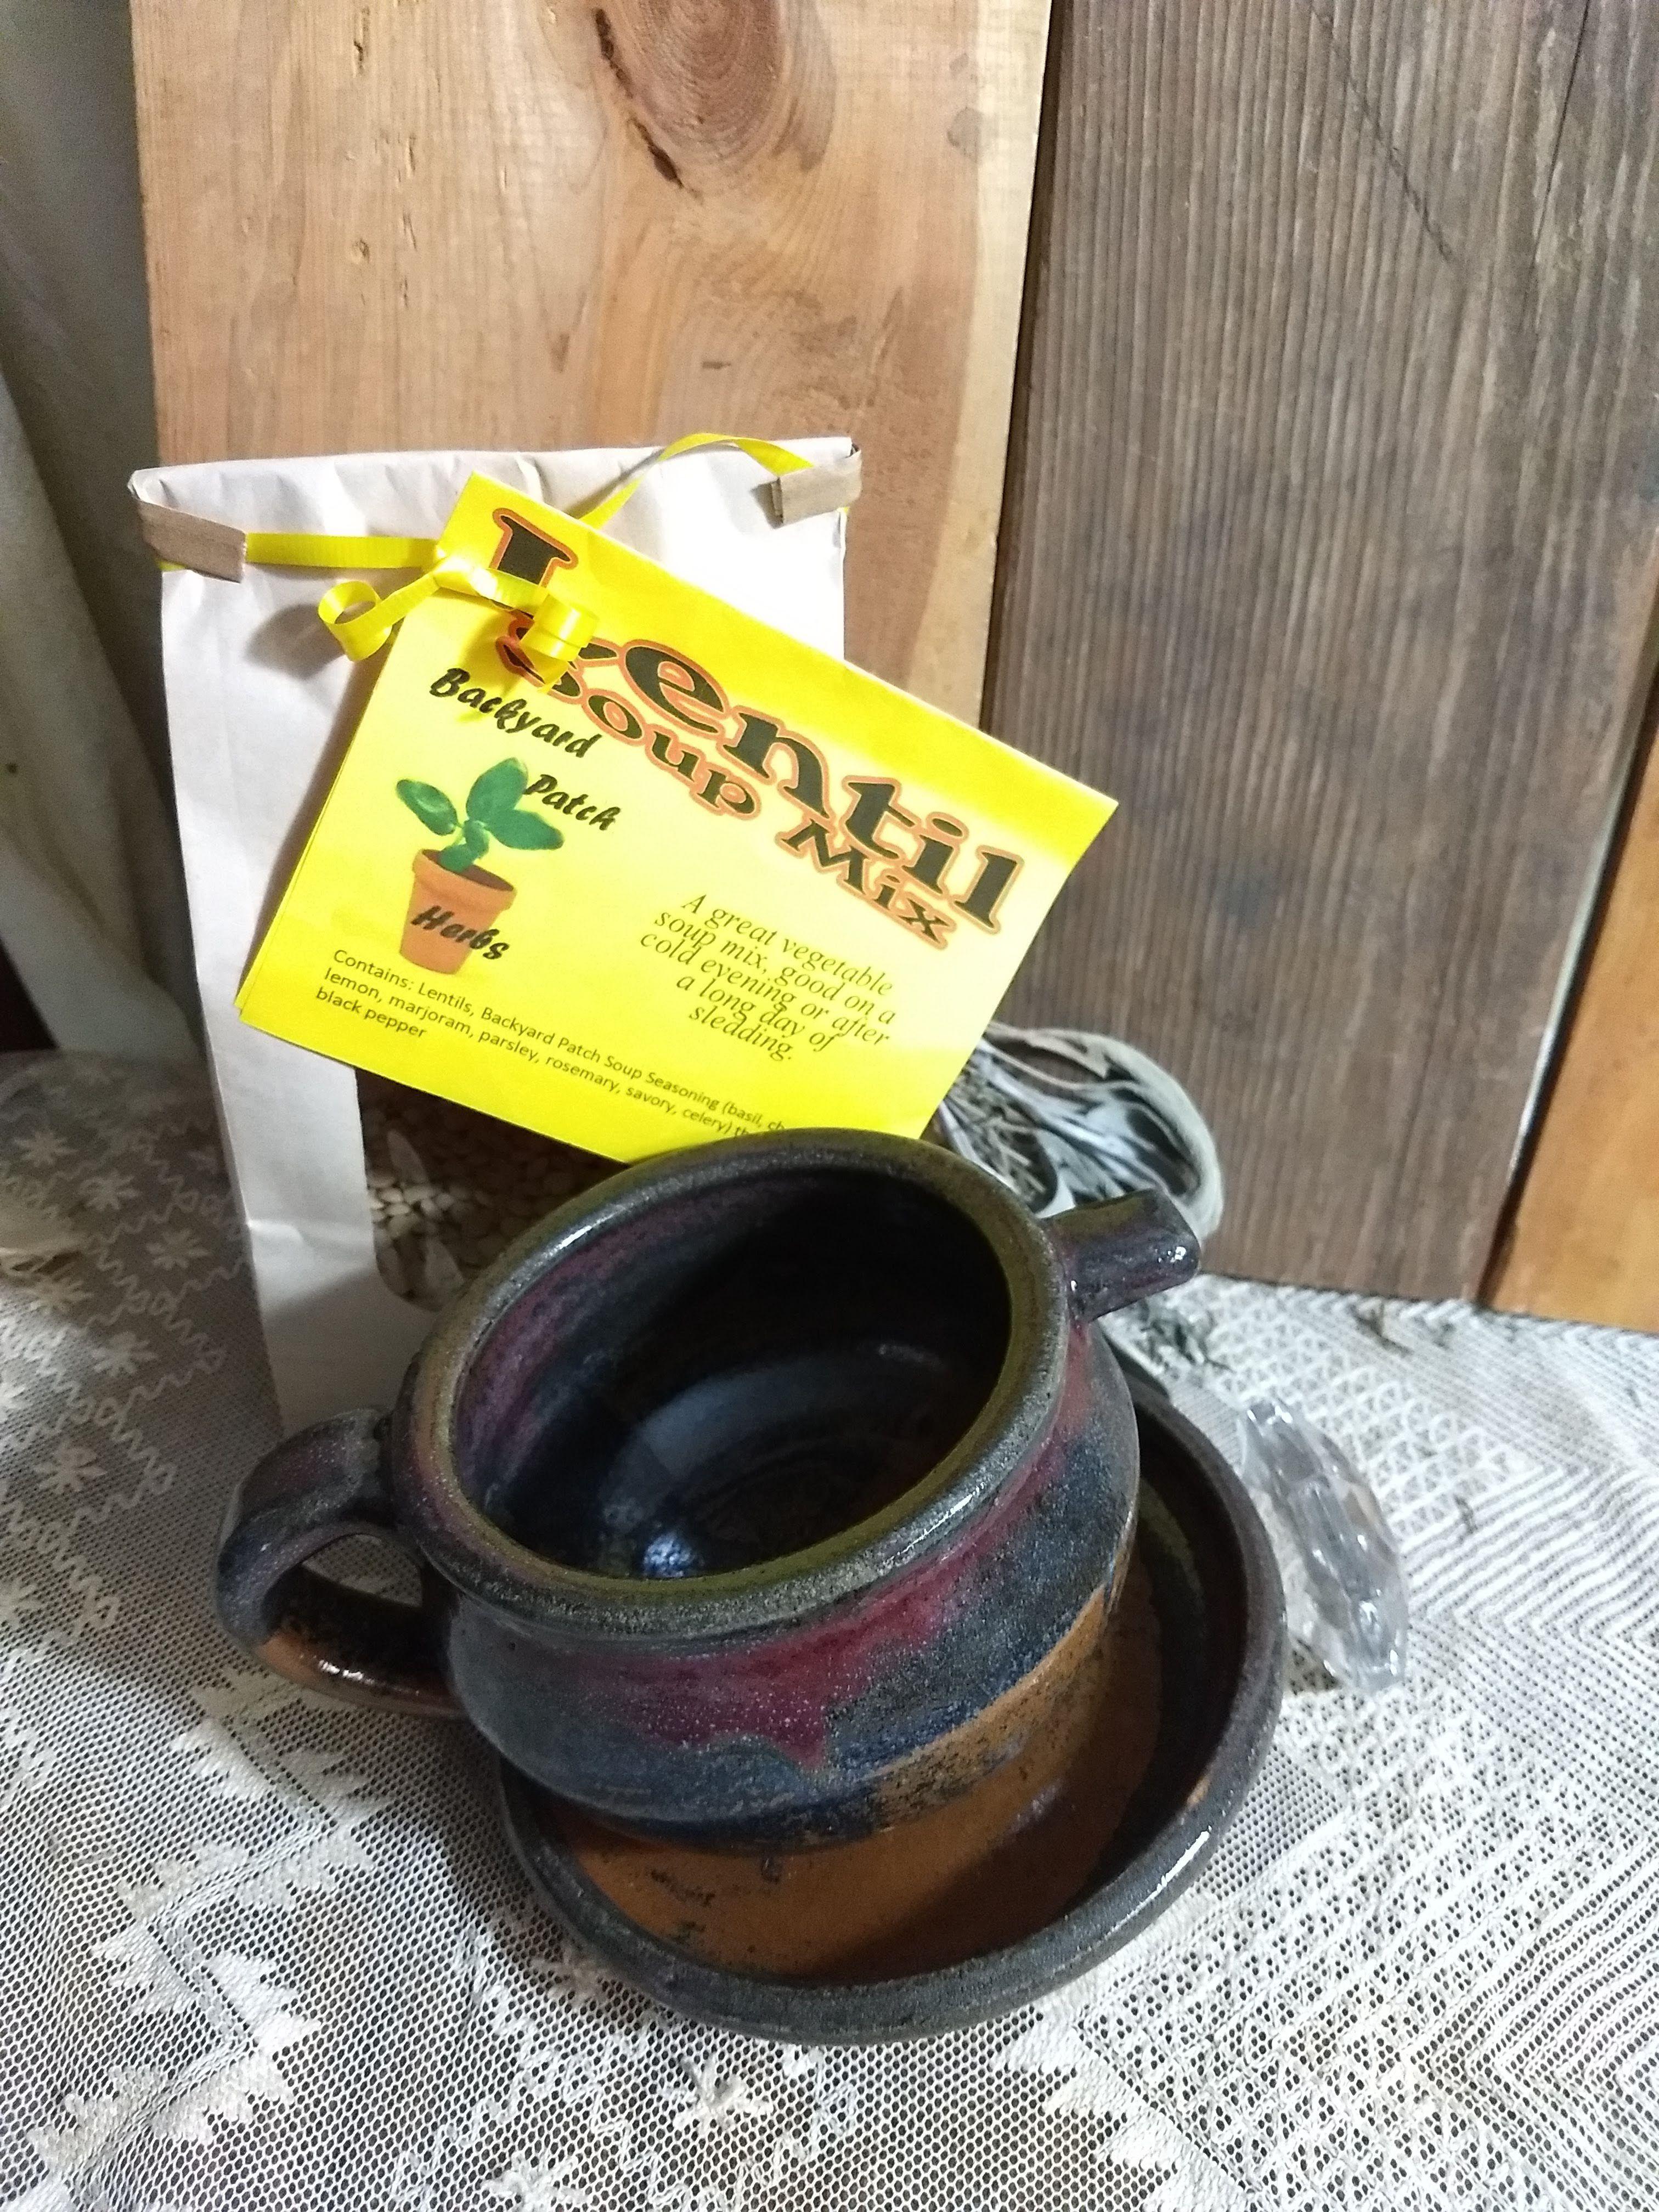 Photo of Handmade Tenmoku Pottery Bowl with Lentil Soup Mix | Gourmet dry soup mix | organic | Backyard Patch Herbs